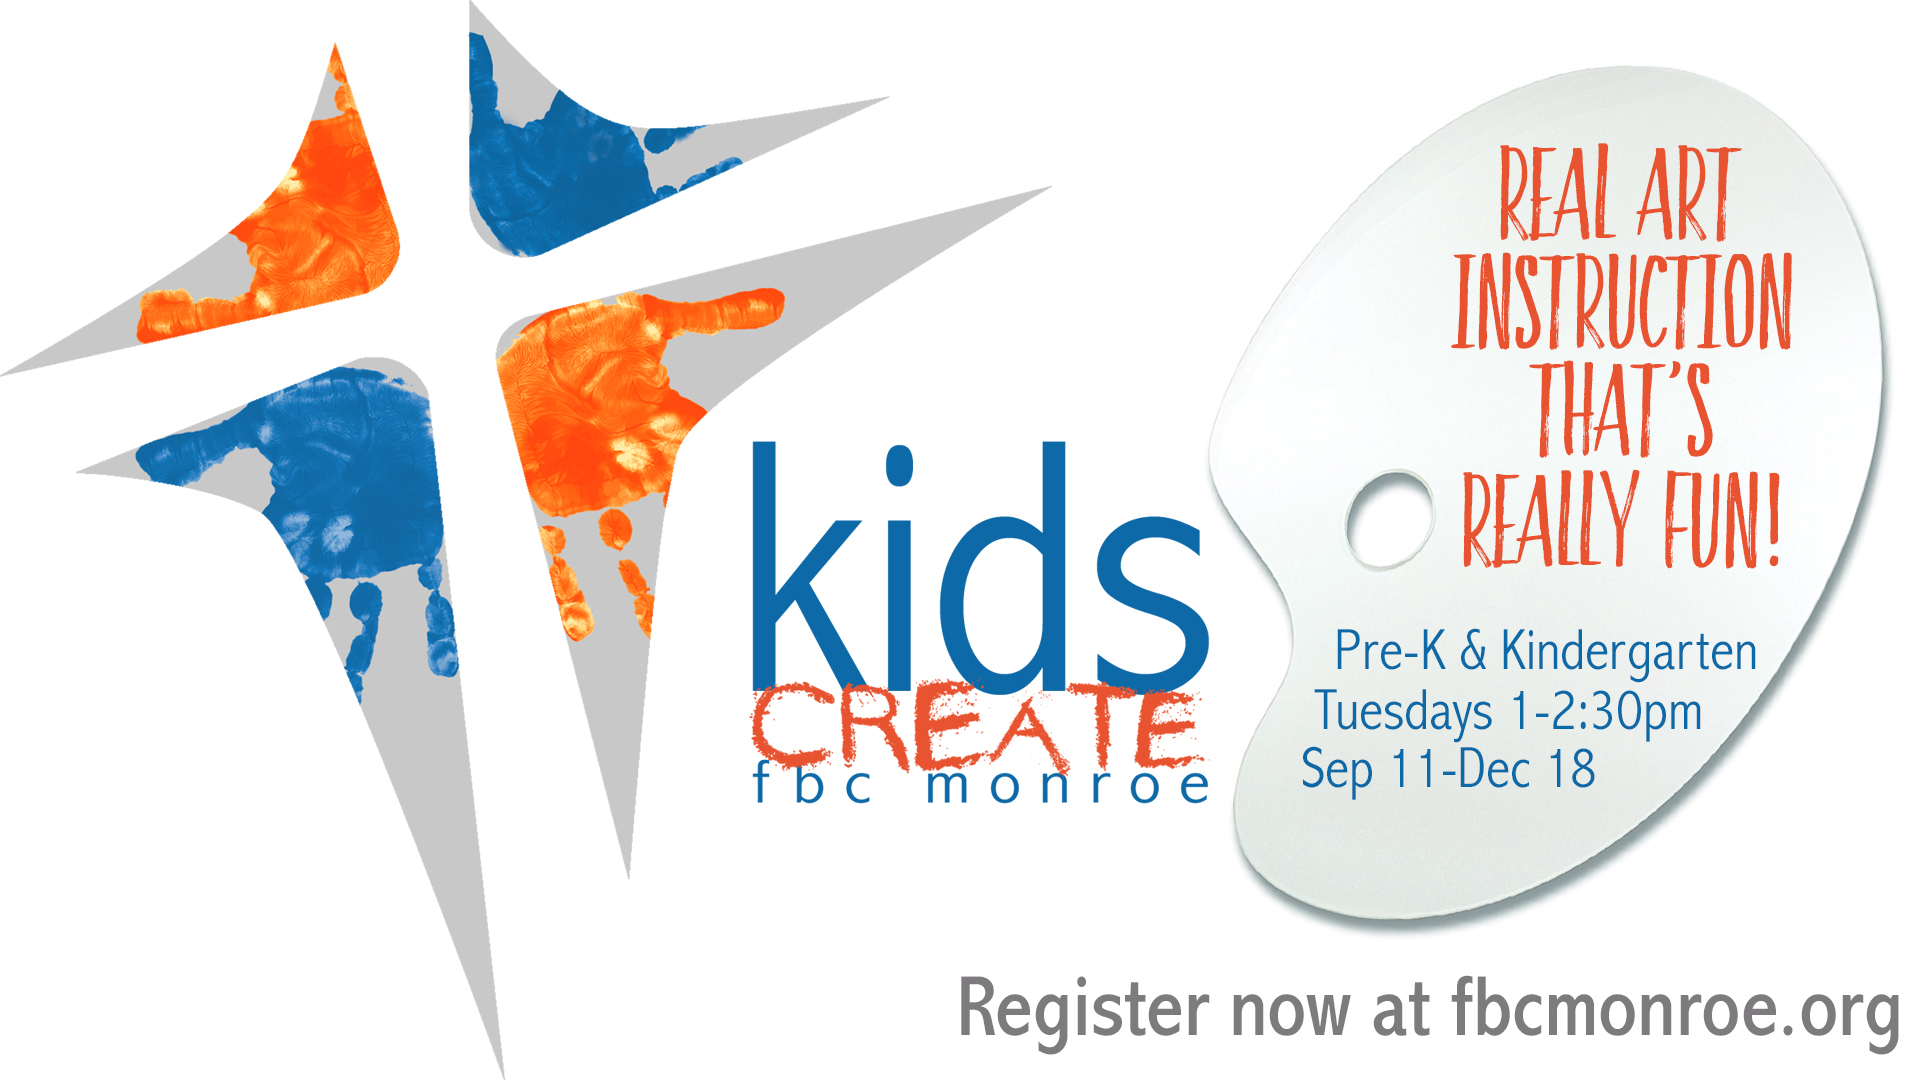 Kids create promo no box